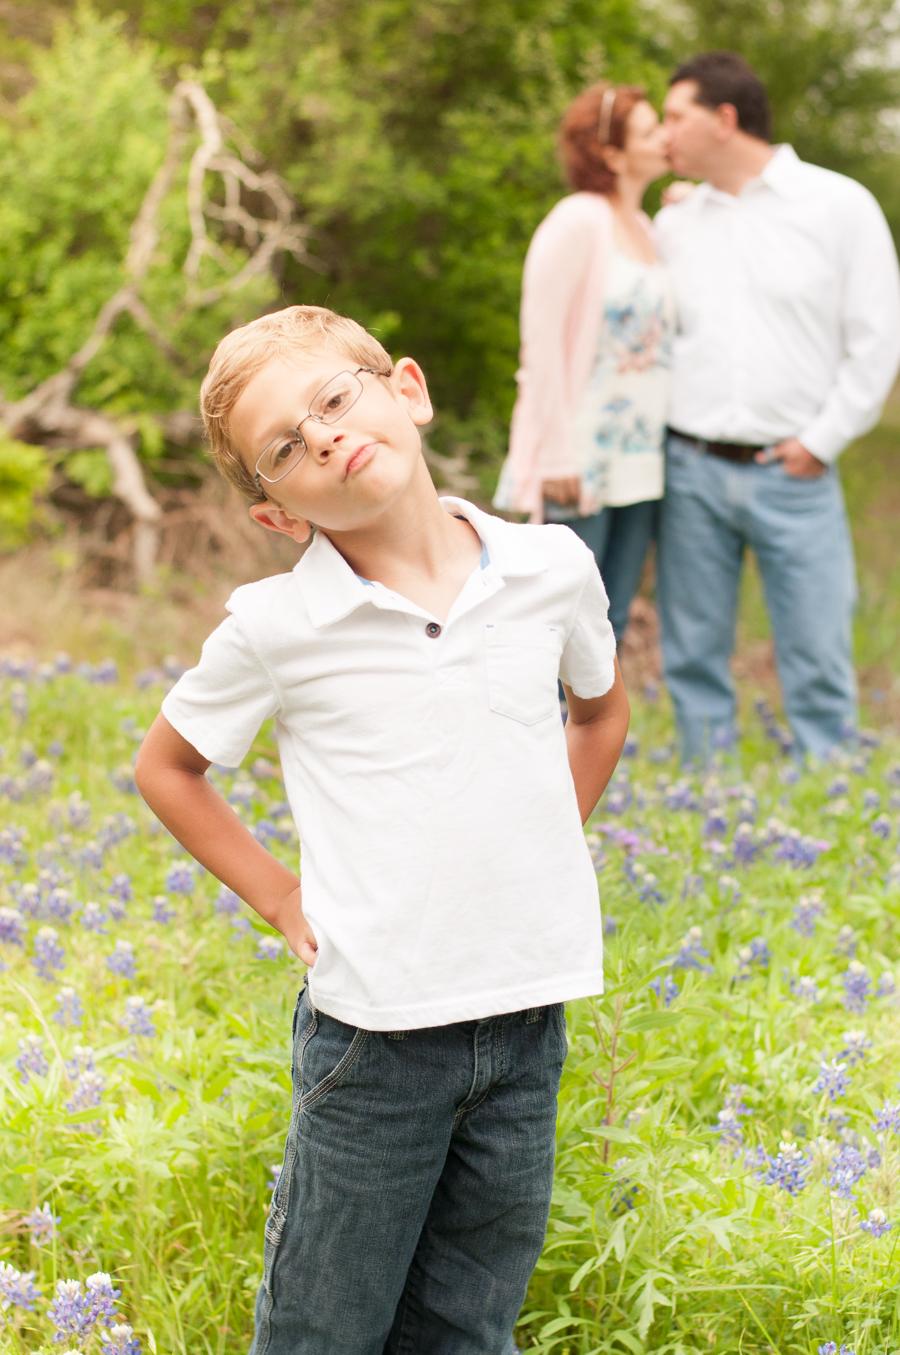 Family Portrait Session in Texas's Bluebonnets